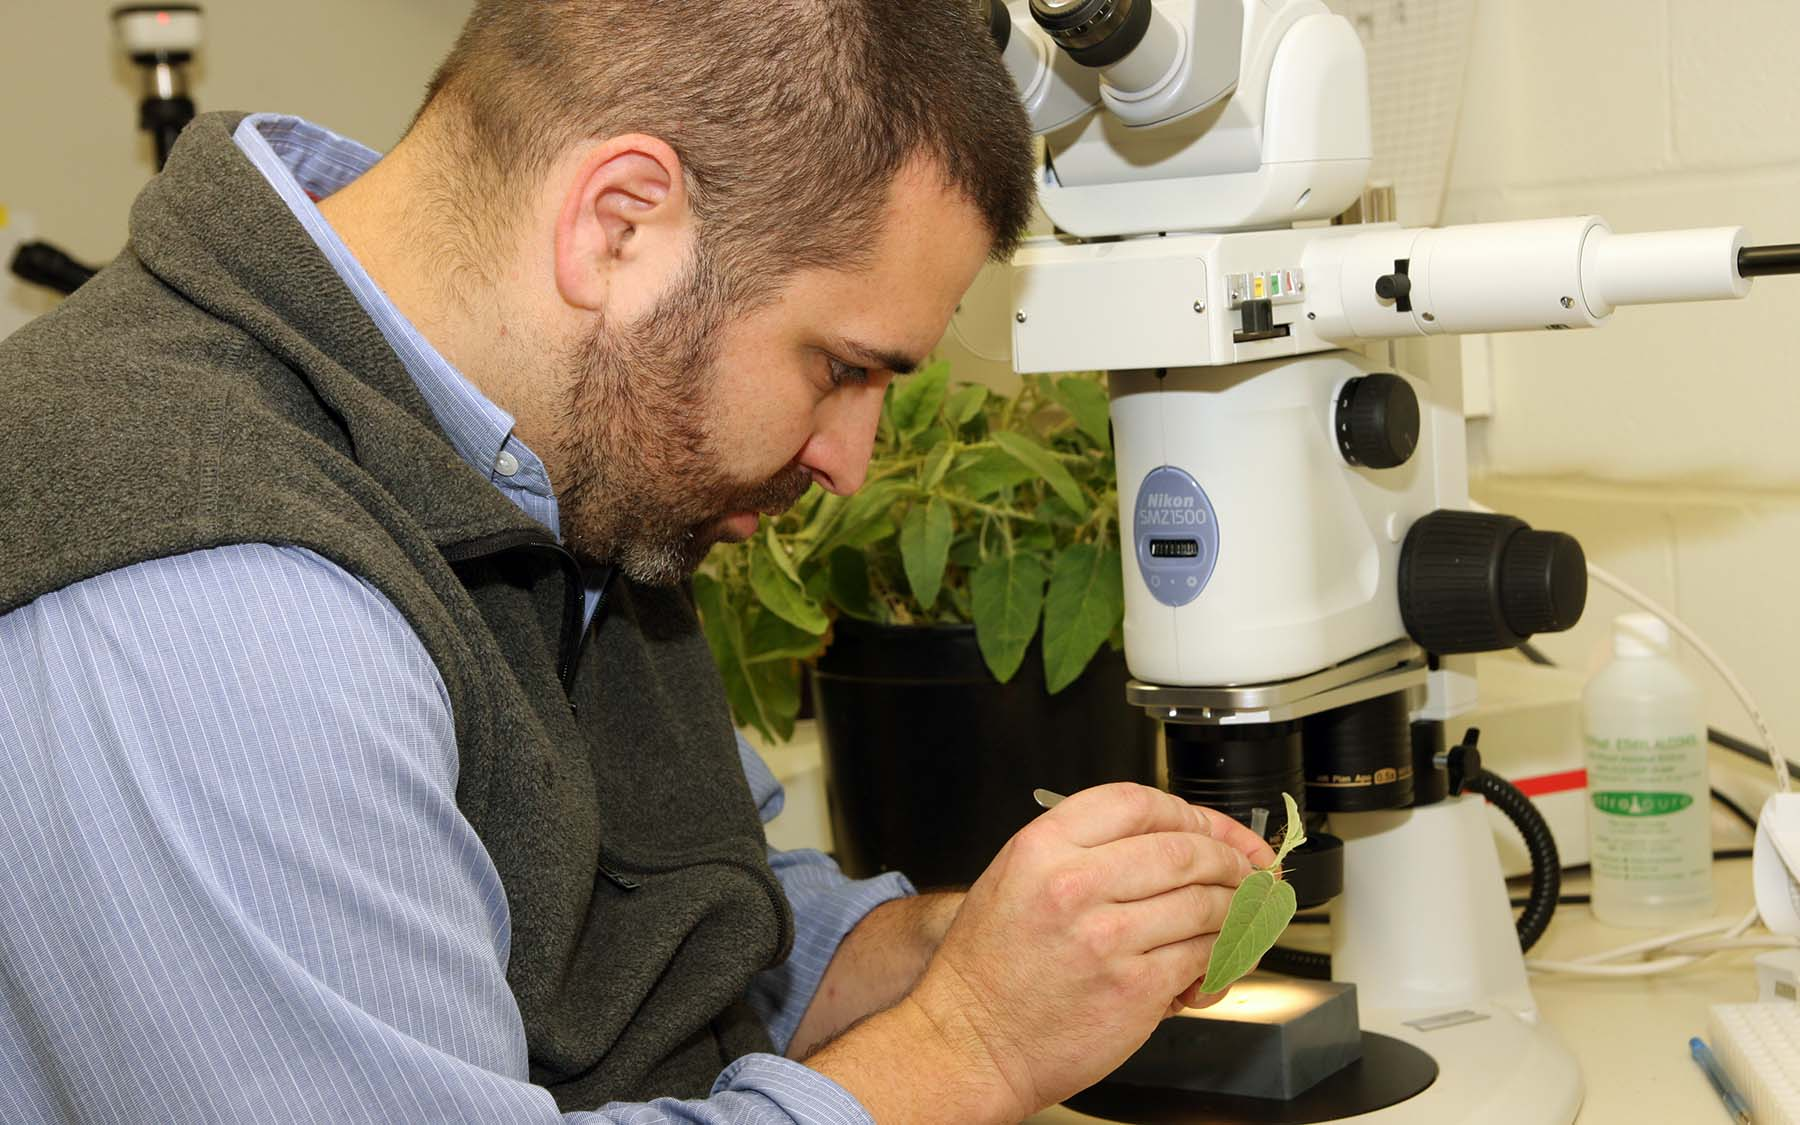 zach lippman examine plant